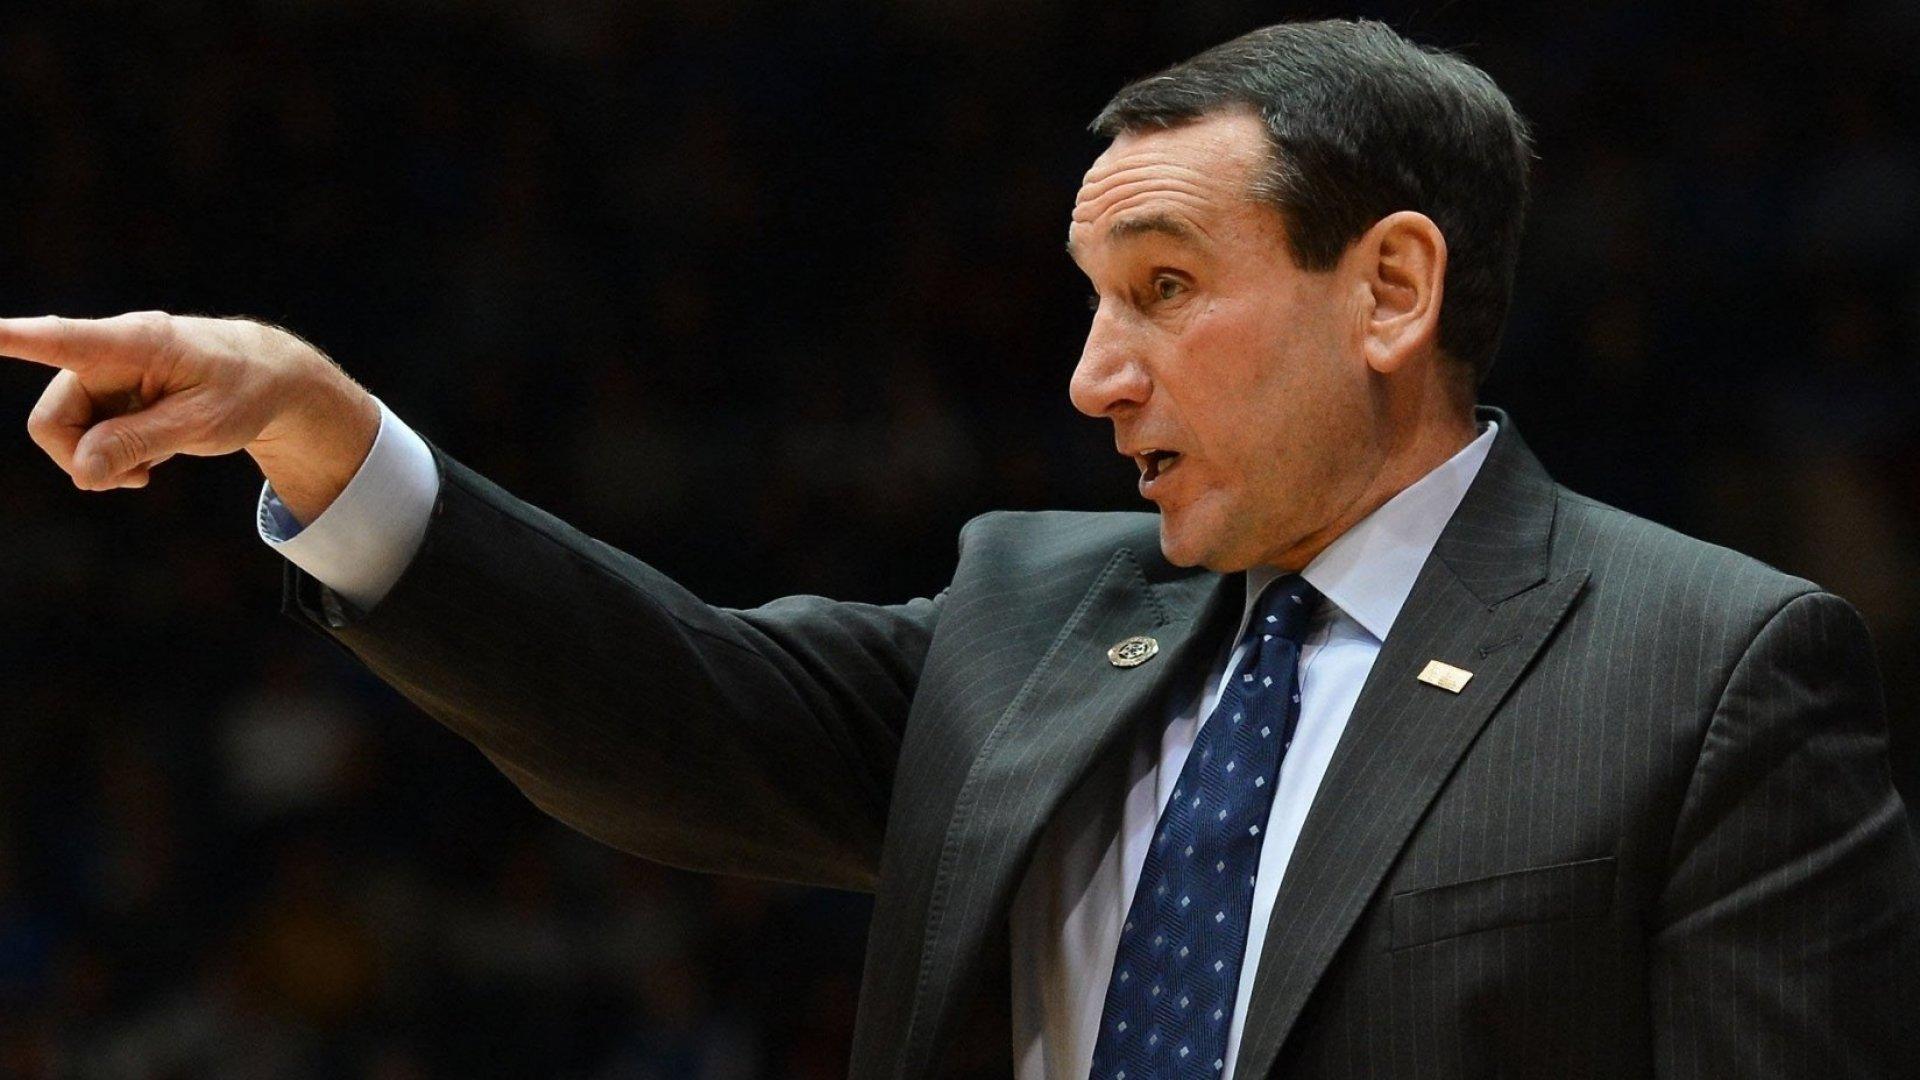 Why Duke's Coach K Runs His Brand Like Steve Jobs